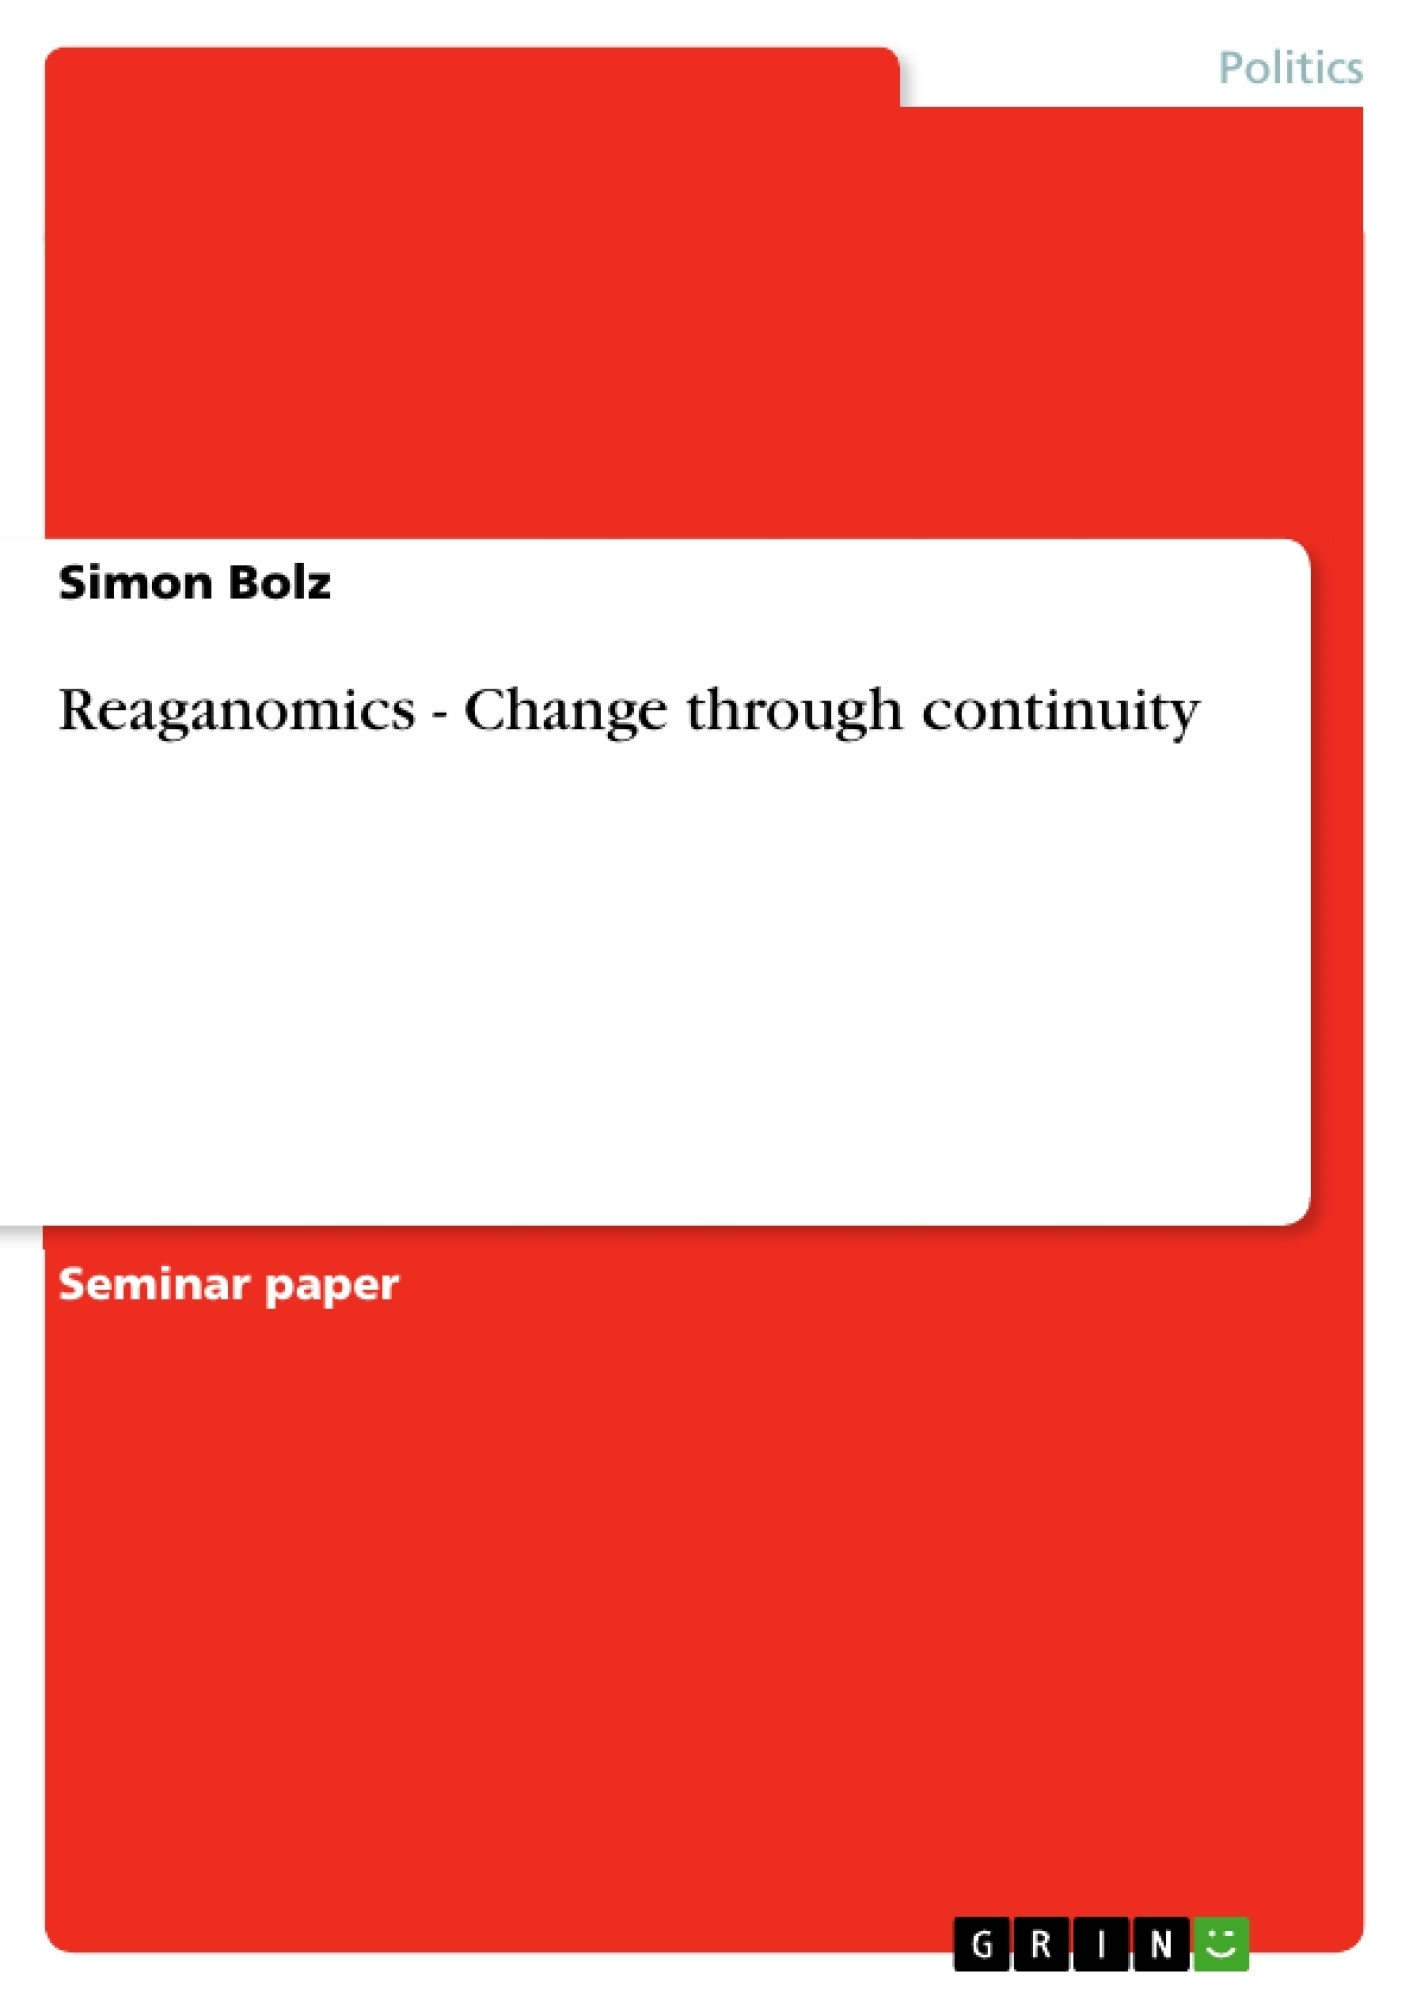 Title: Reaganomics - Change through continuity